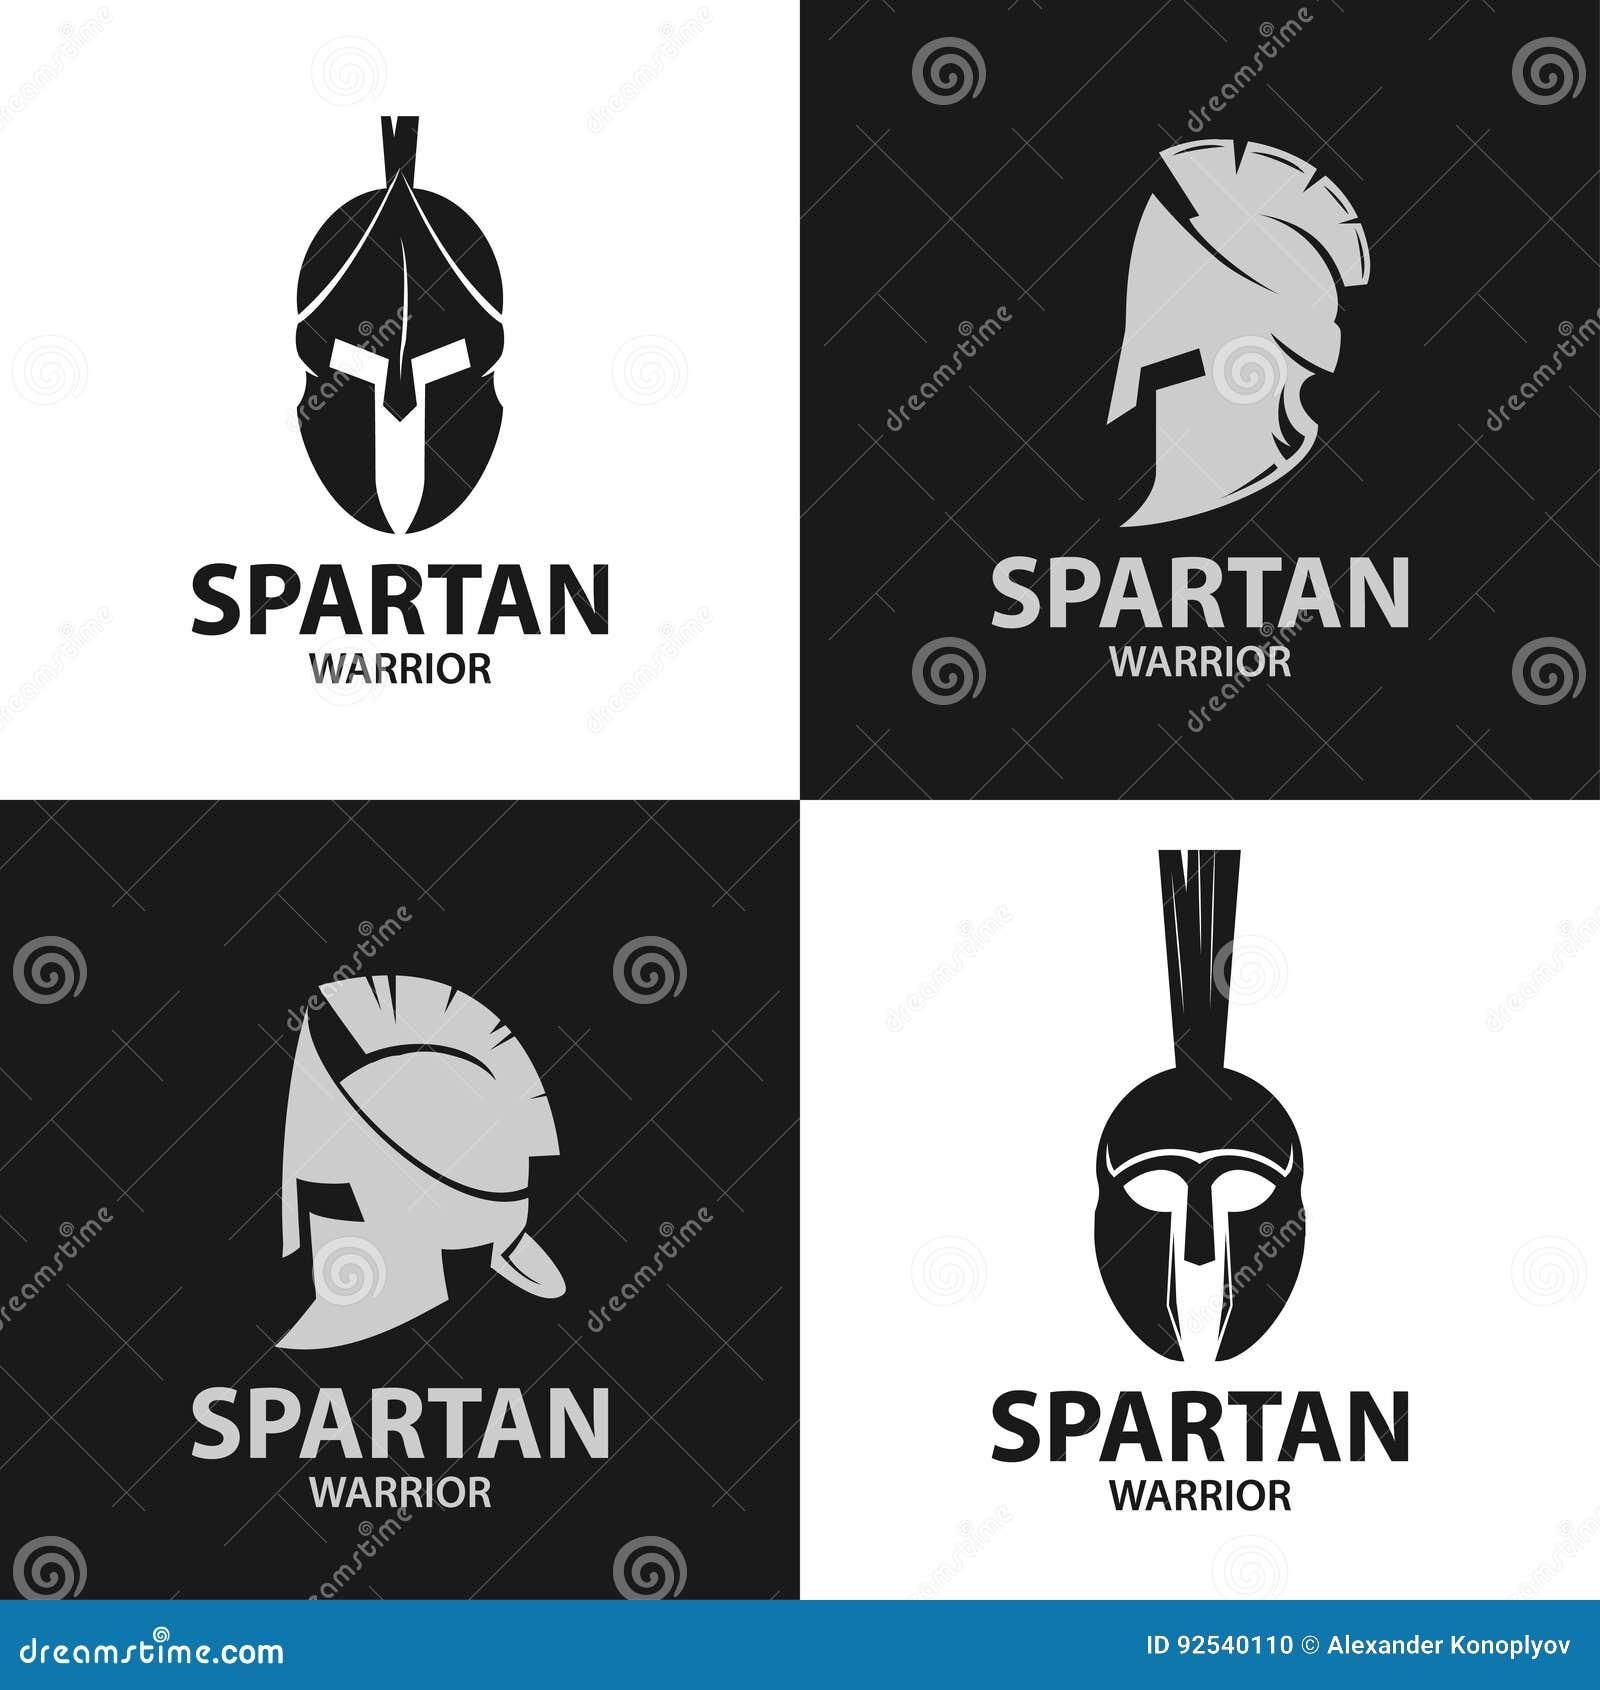 Helmets spartan warriors icon stock vector illustration of helmets spartan warriors icon biocorpaavc